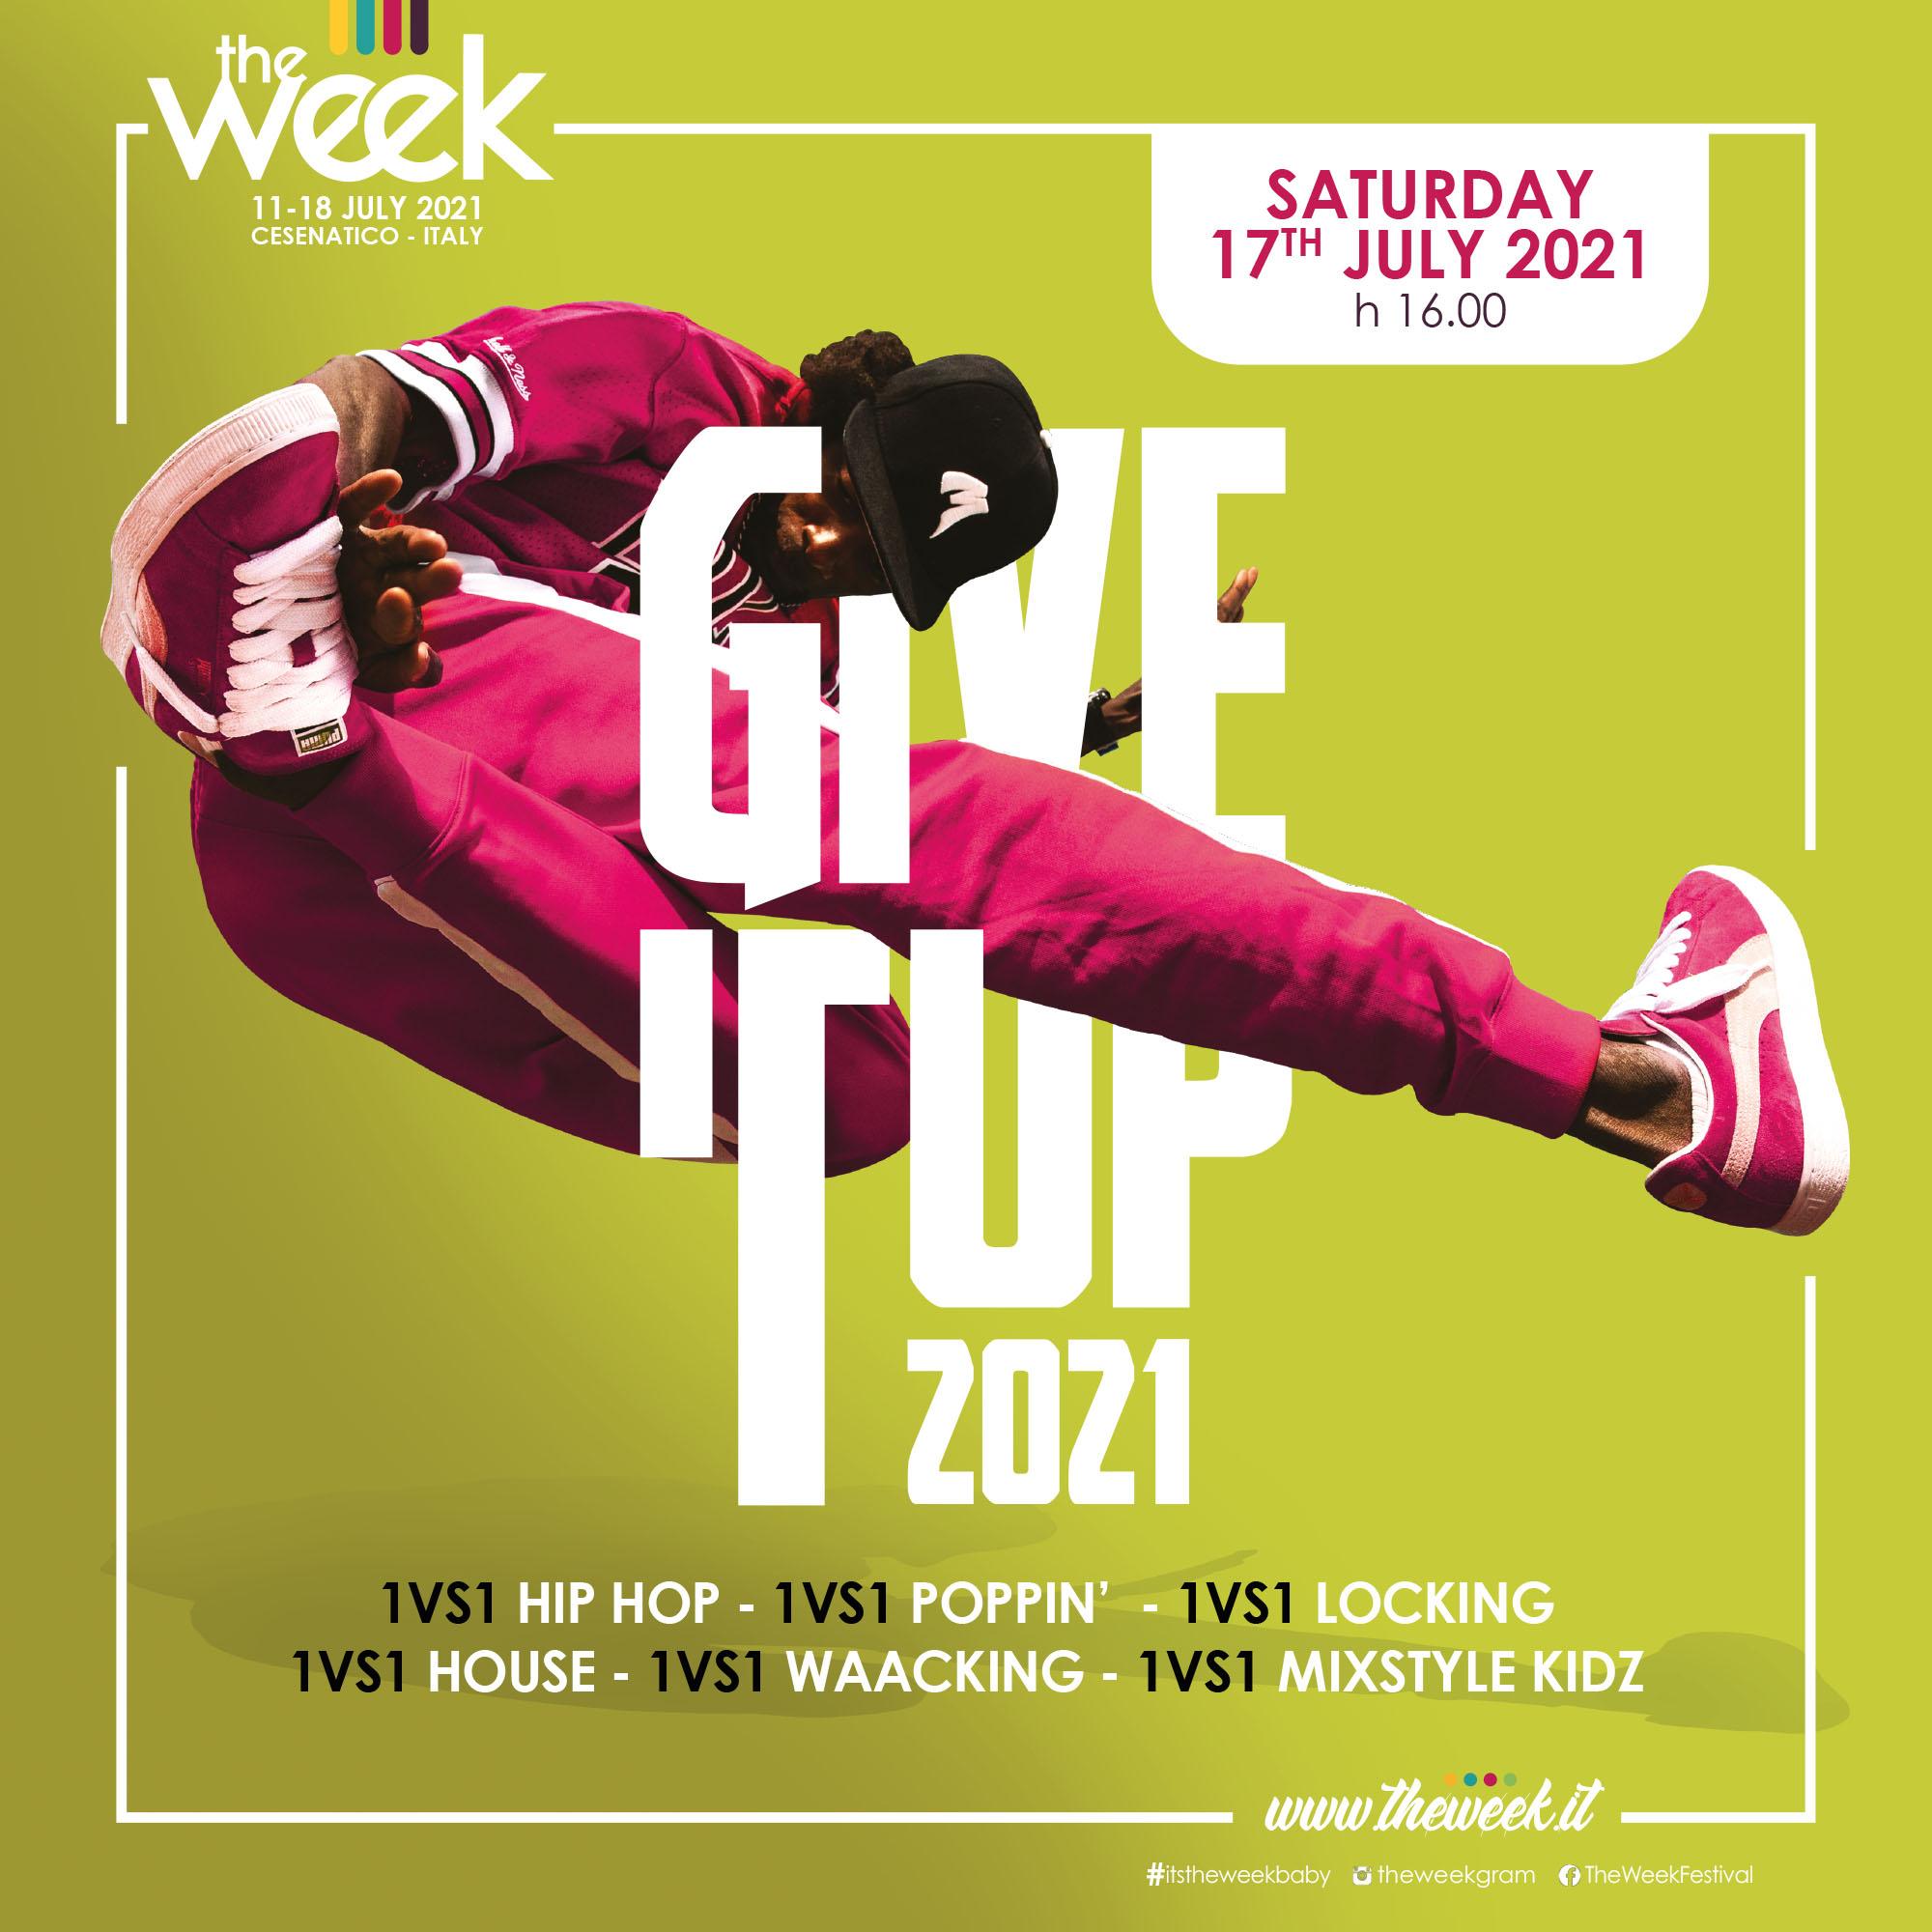 Give It Up Dj Ake Dj Lil Jean Dj Simo Piazza Spose Dei Marinai The Week Street Dance Summer Camp Cesenatico Italy Workshop Stage Hip Hop Festival